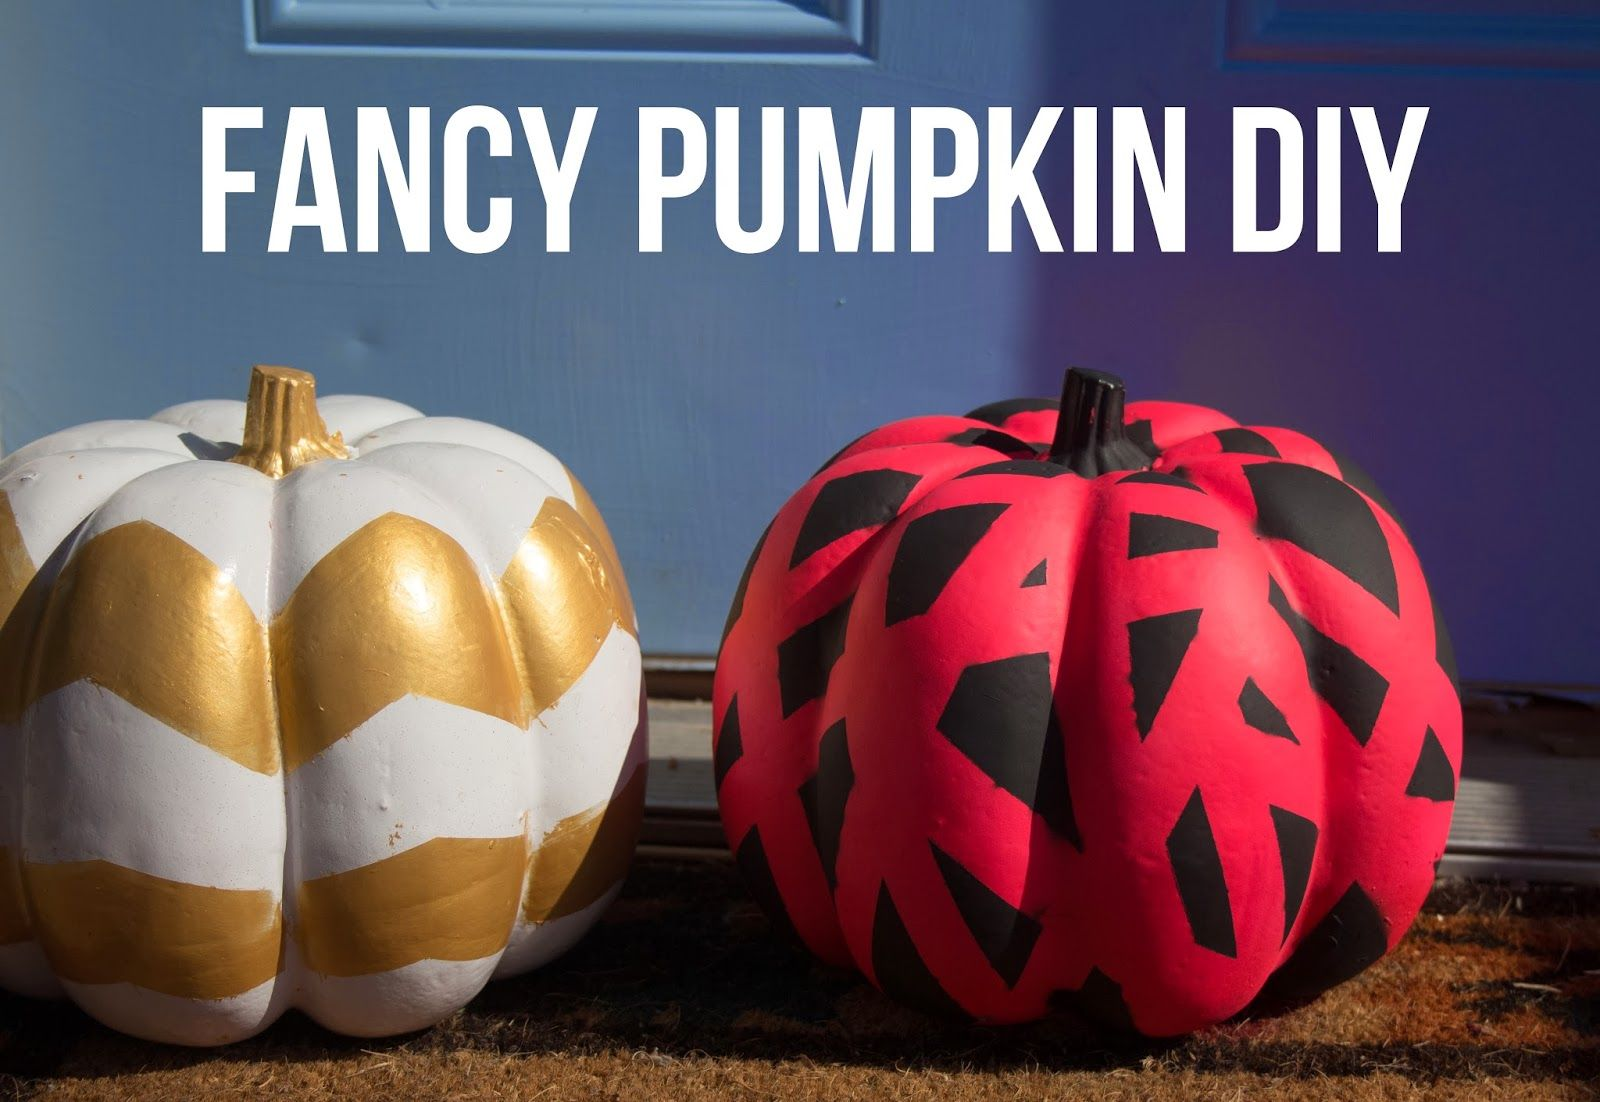 Fancy Pumpkin Diy Diy Pumpkin Pumpkin Decorating Diy Halloween